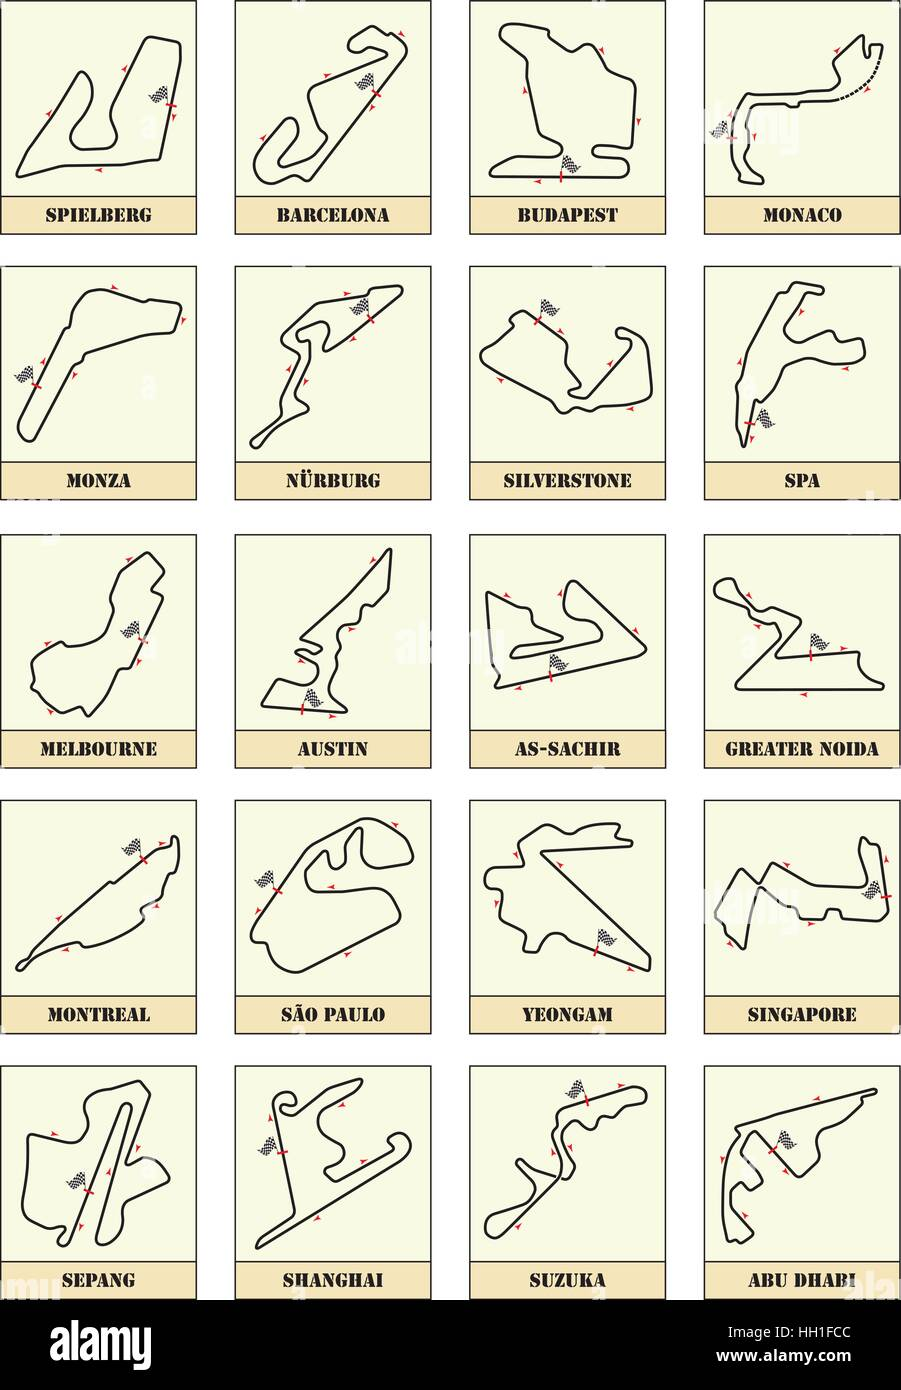 f1 racing circuit maps - Stock Image